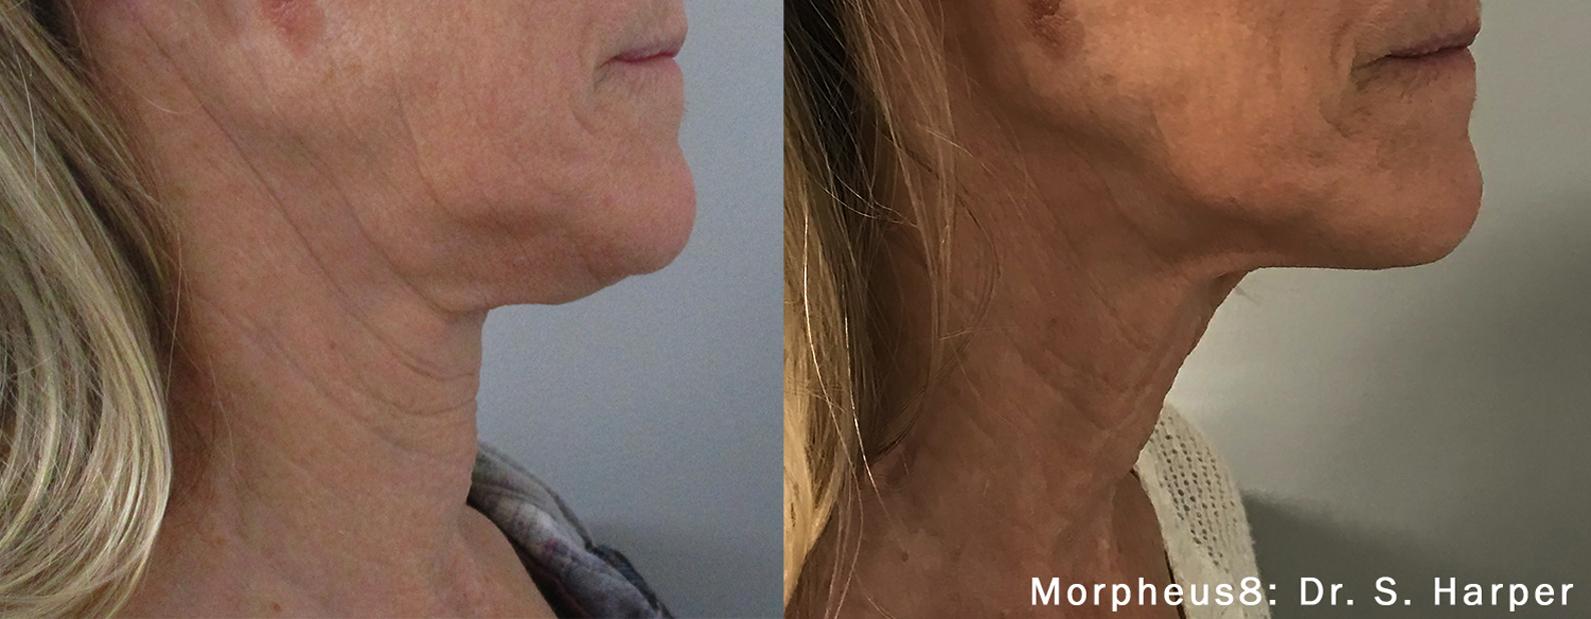 Morpheus8 Skin Tightening Chin Lift